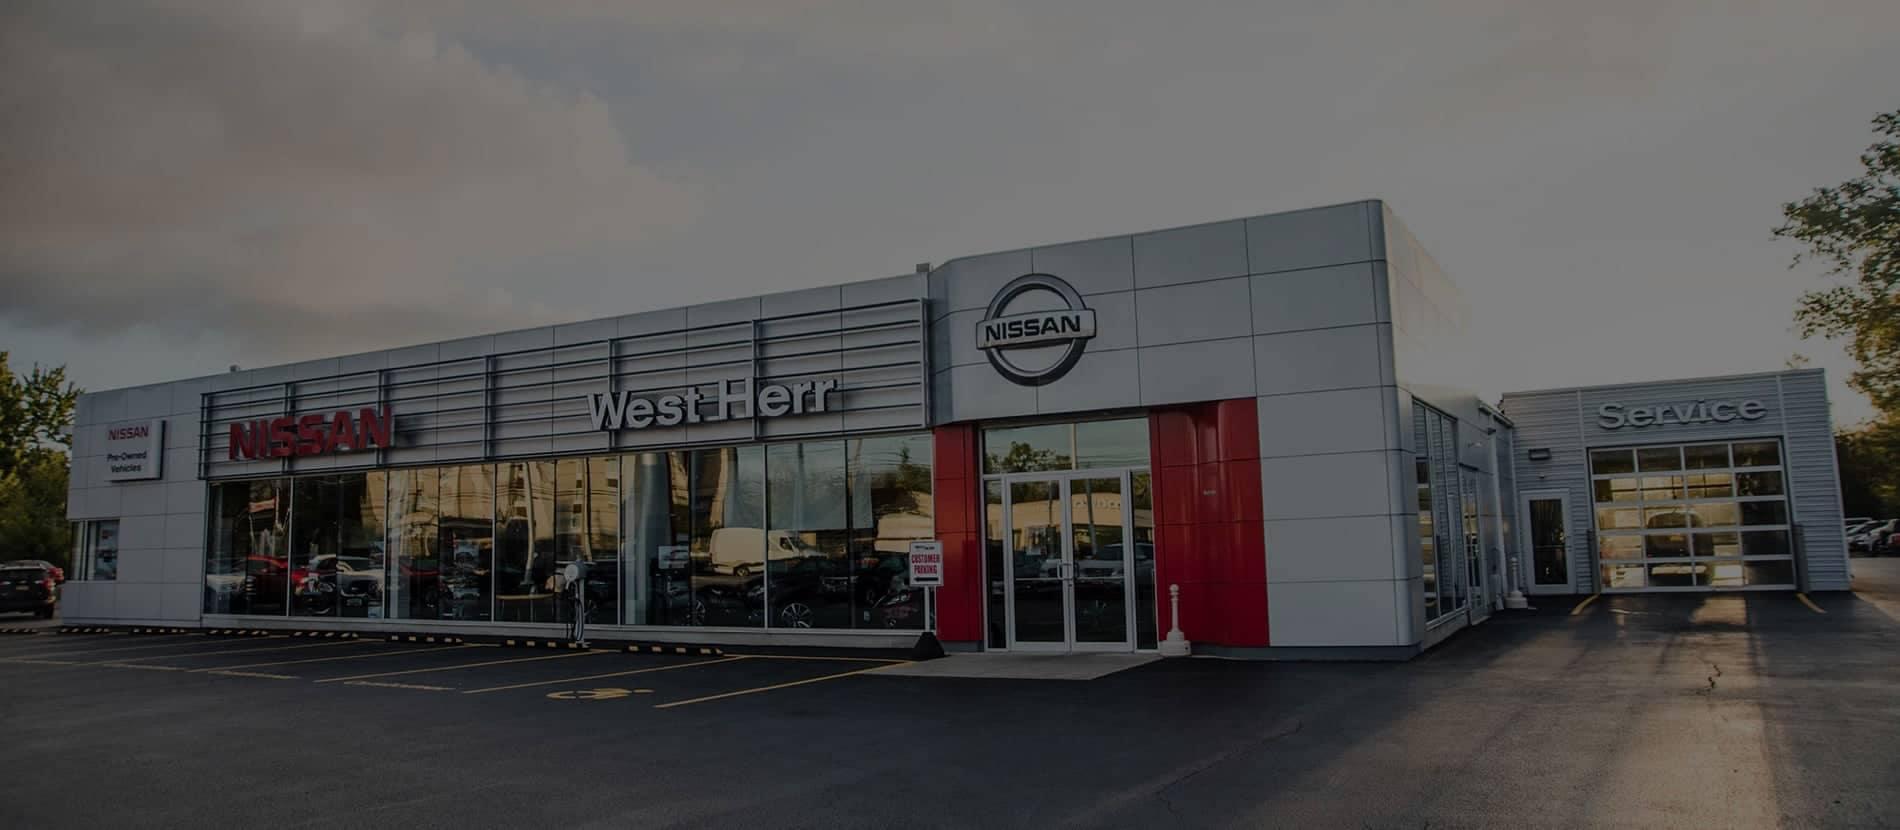 West Herr Nissan lockpot dealership image